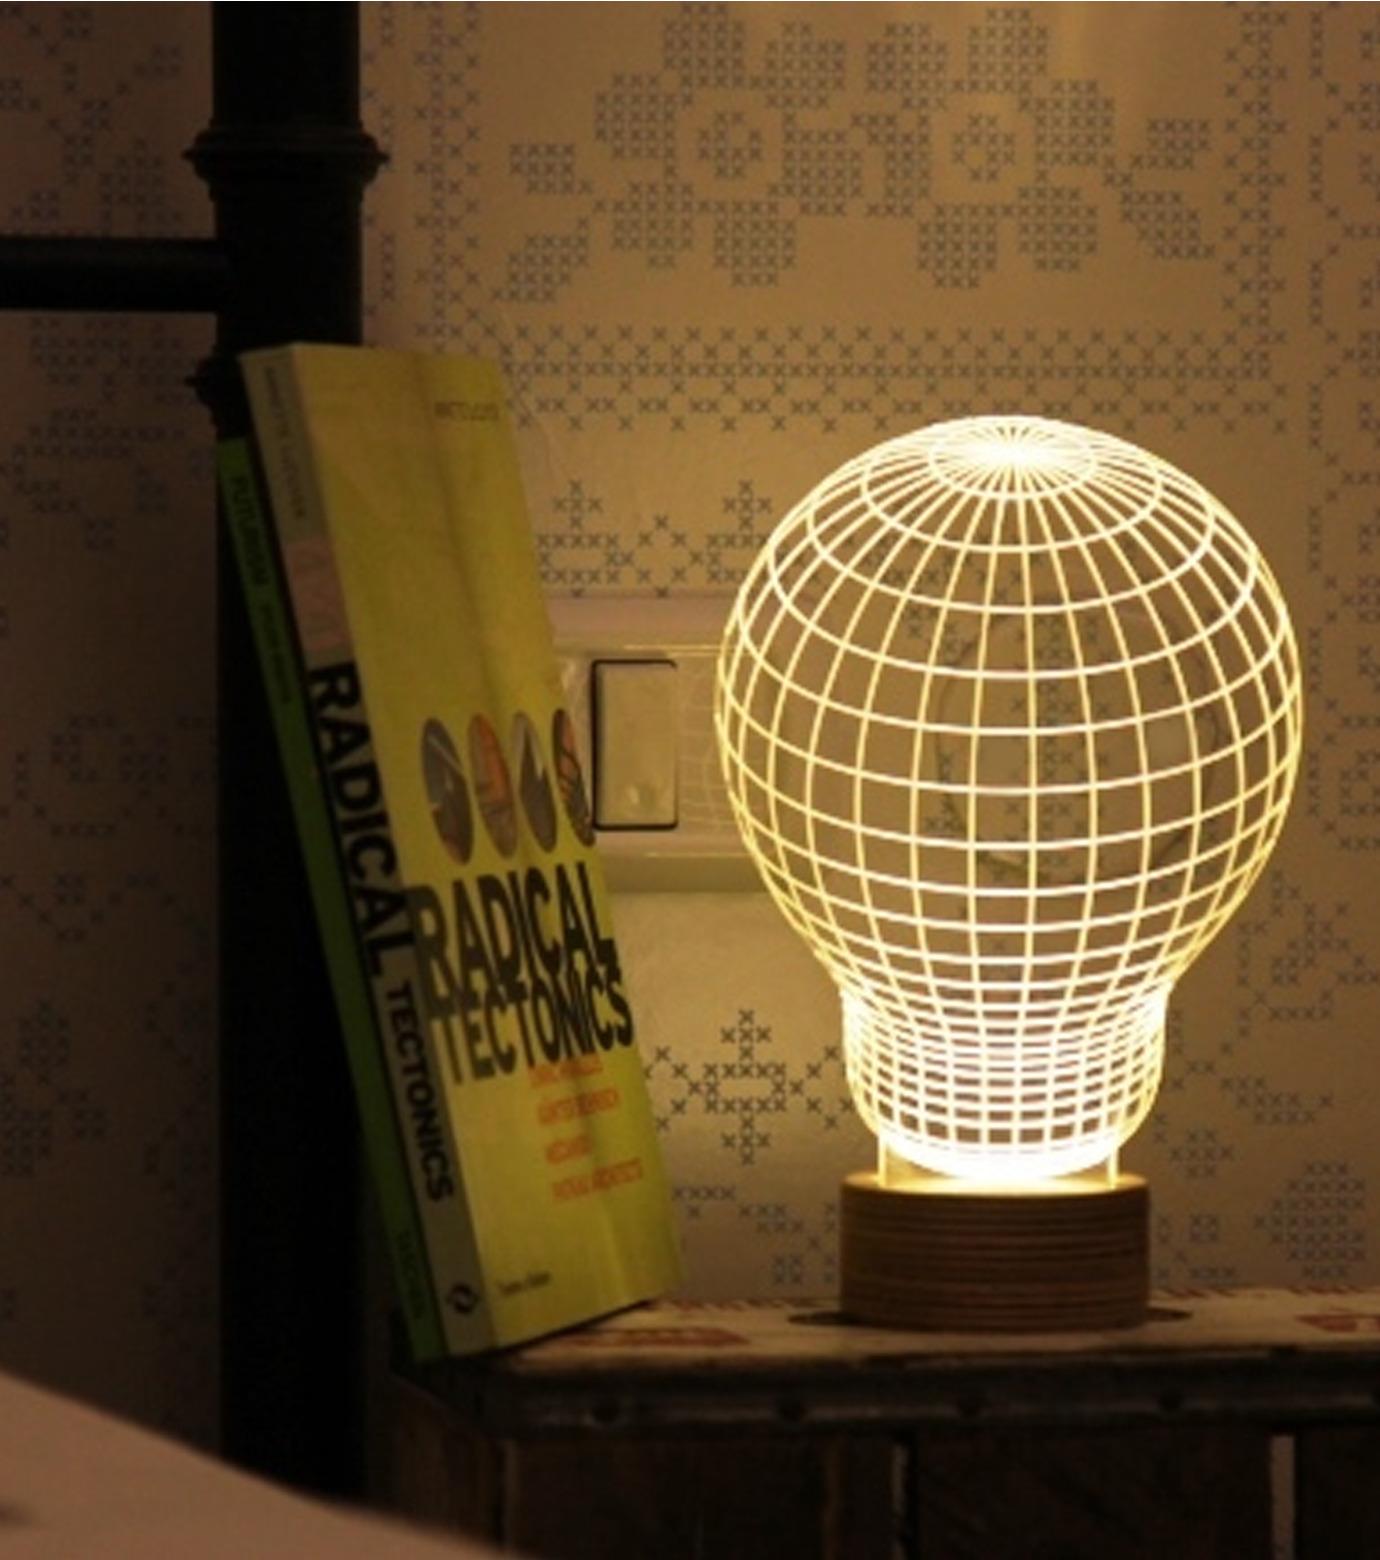 Bulbing(バルビング)のBULBING Lamp-NONE(ライト/light)-480519-0 拡大詳細画像3